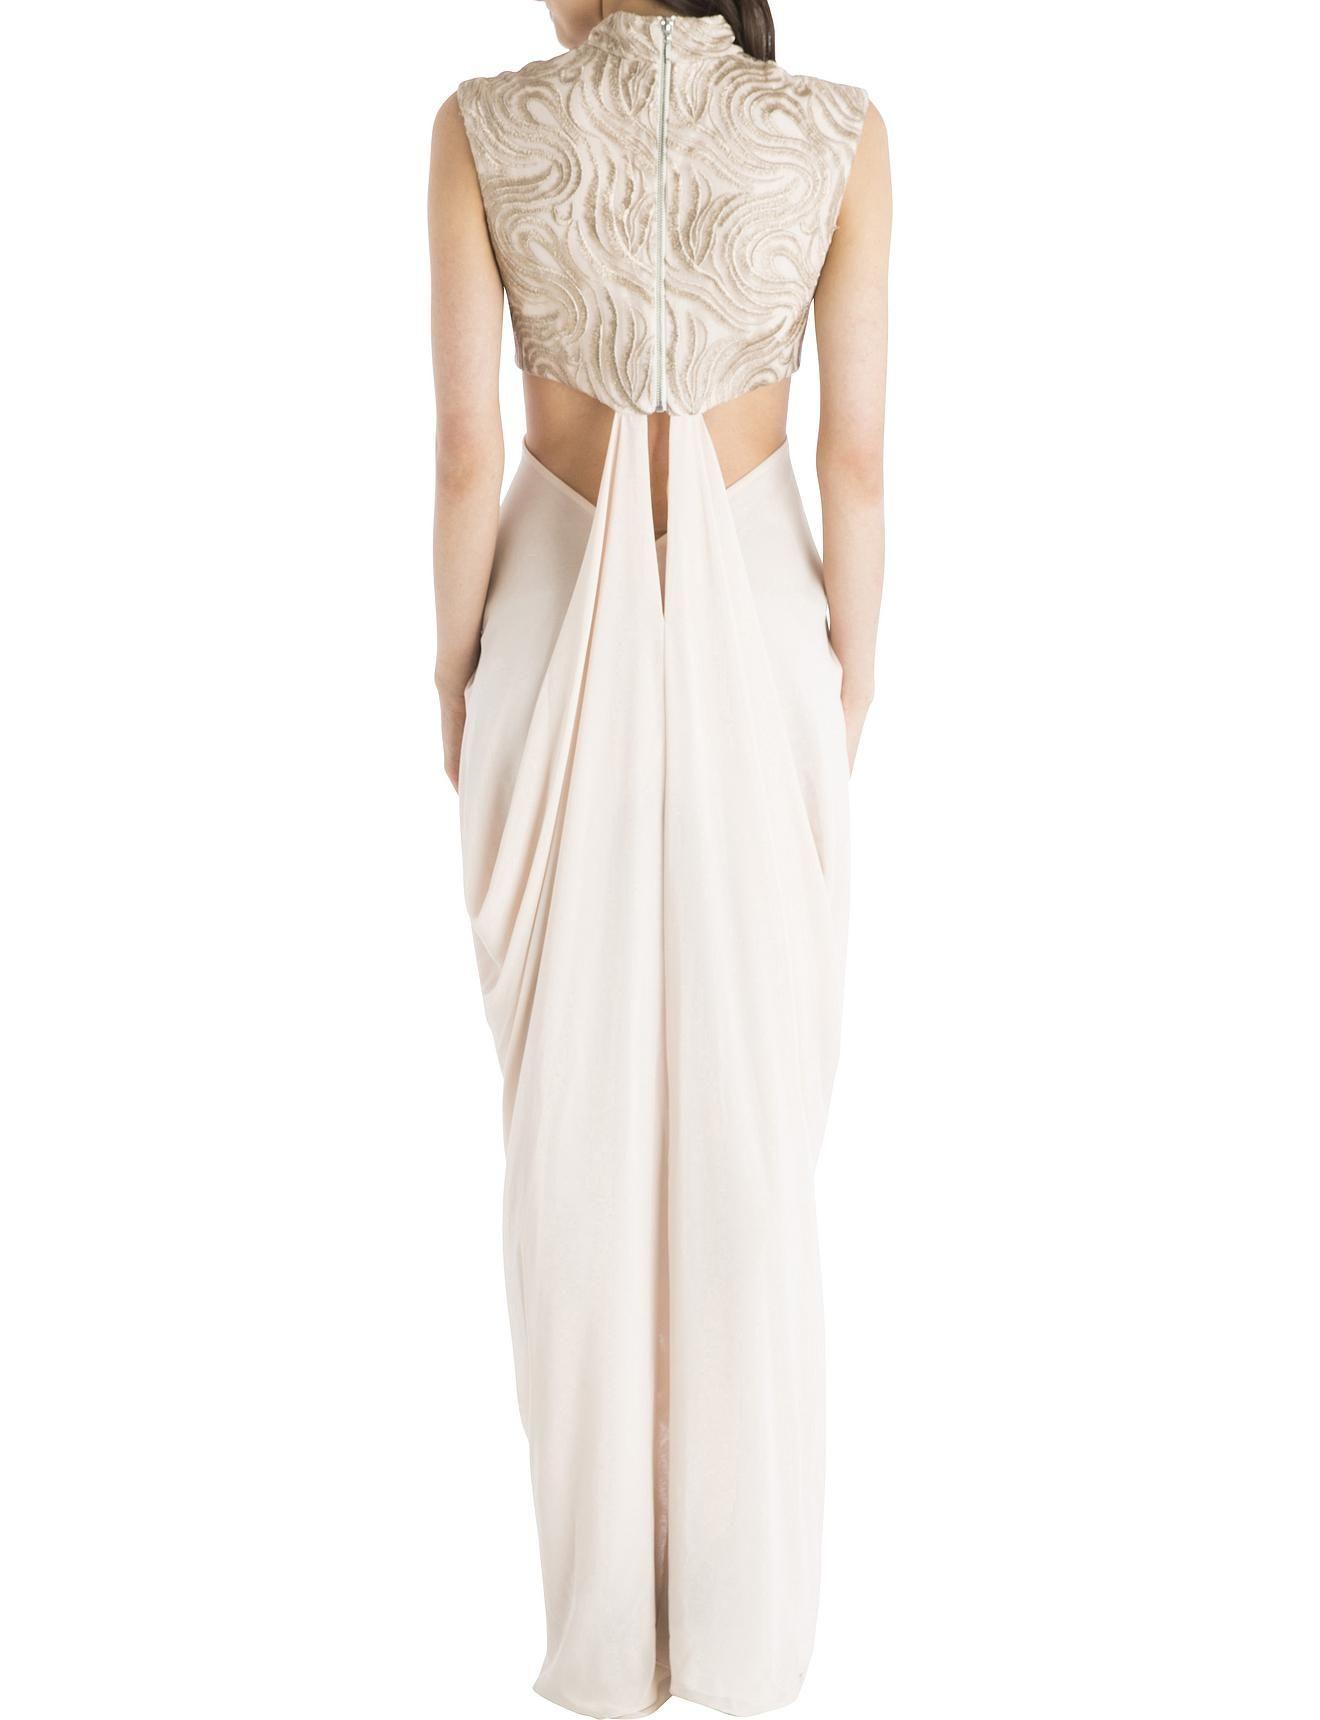 Carla Zampatti Pink Blush Vintage Lace Opera Gown